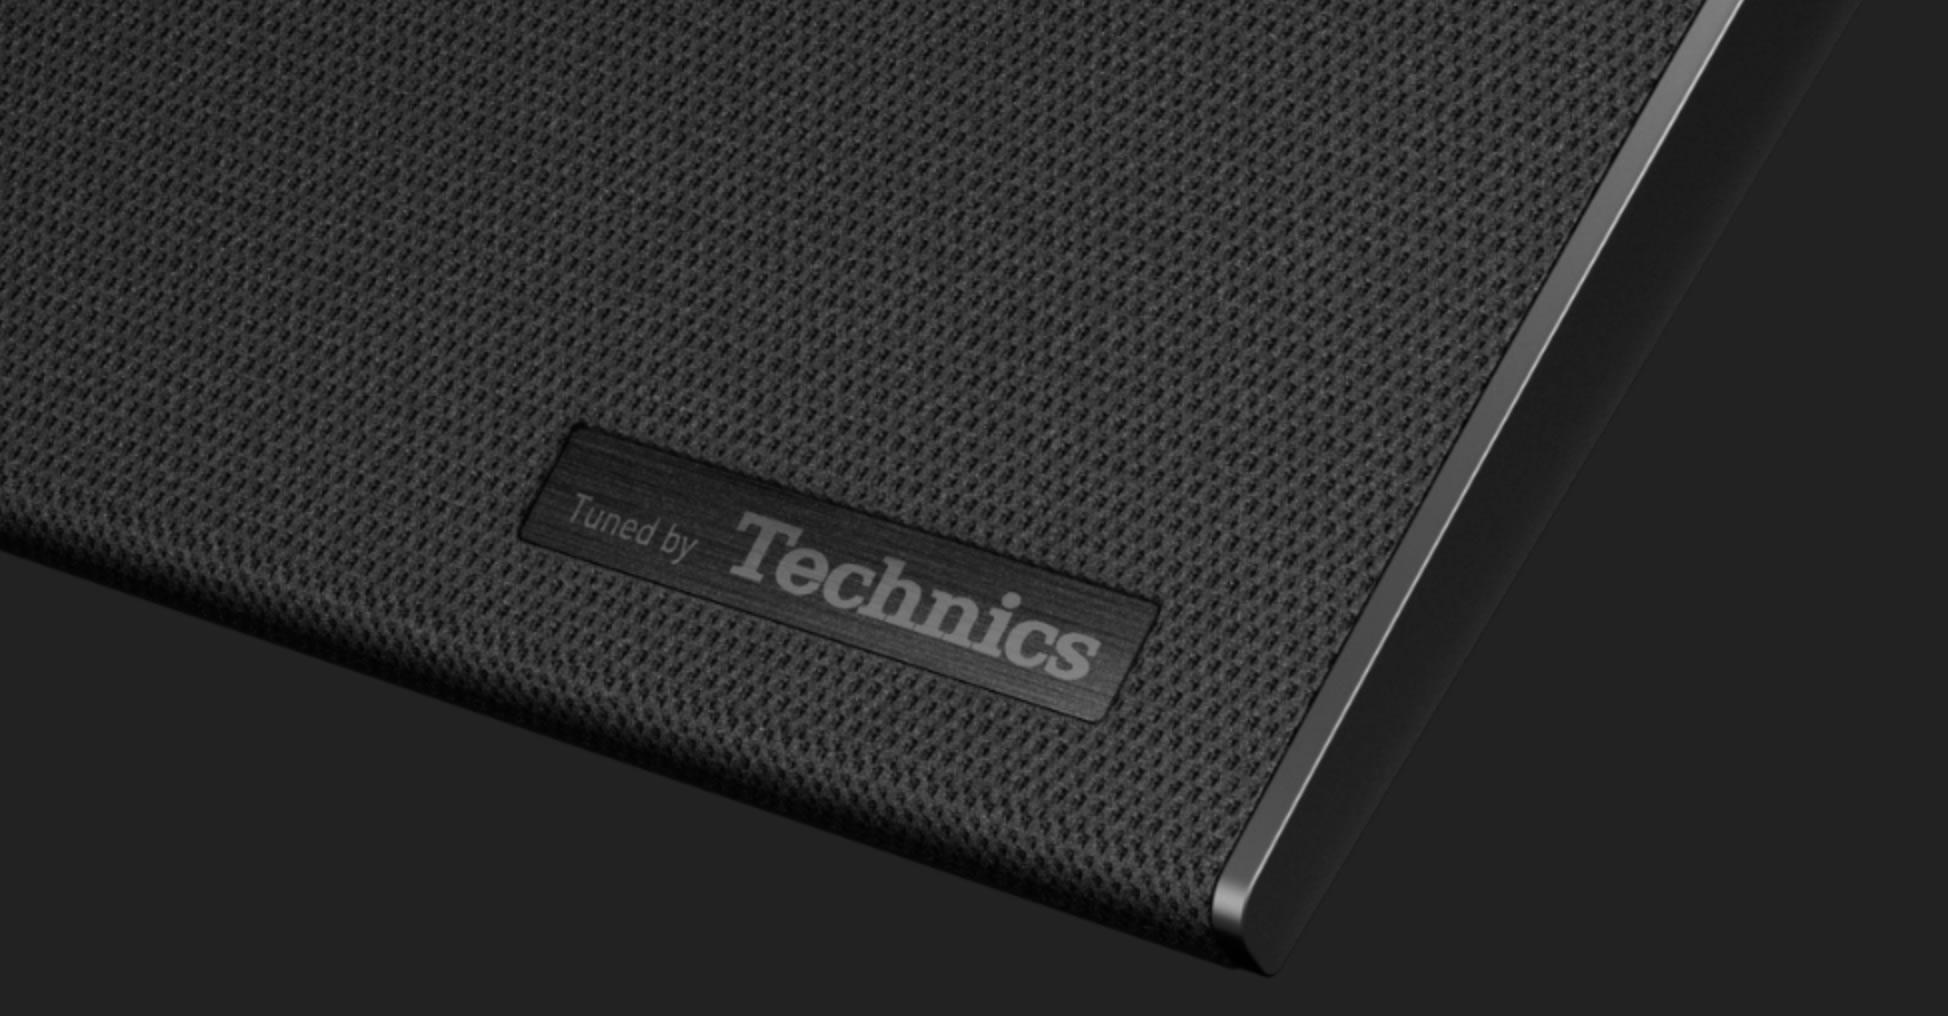 Panasonic FZ950 Tuned by Technics